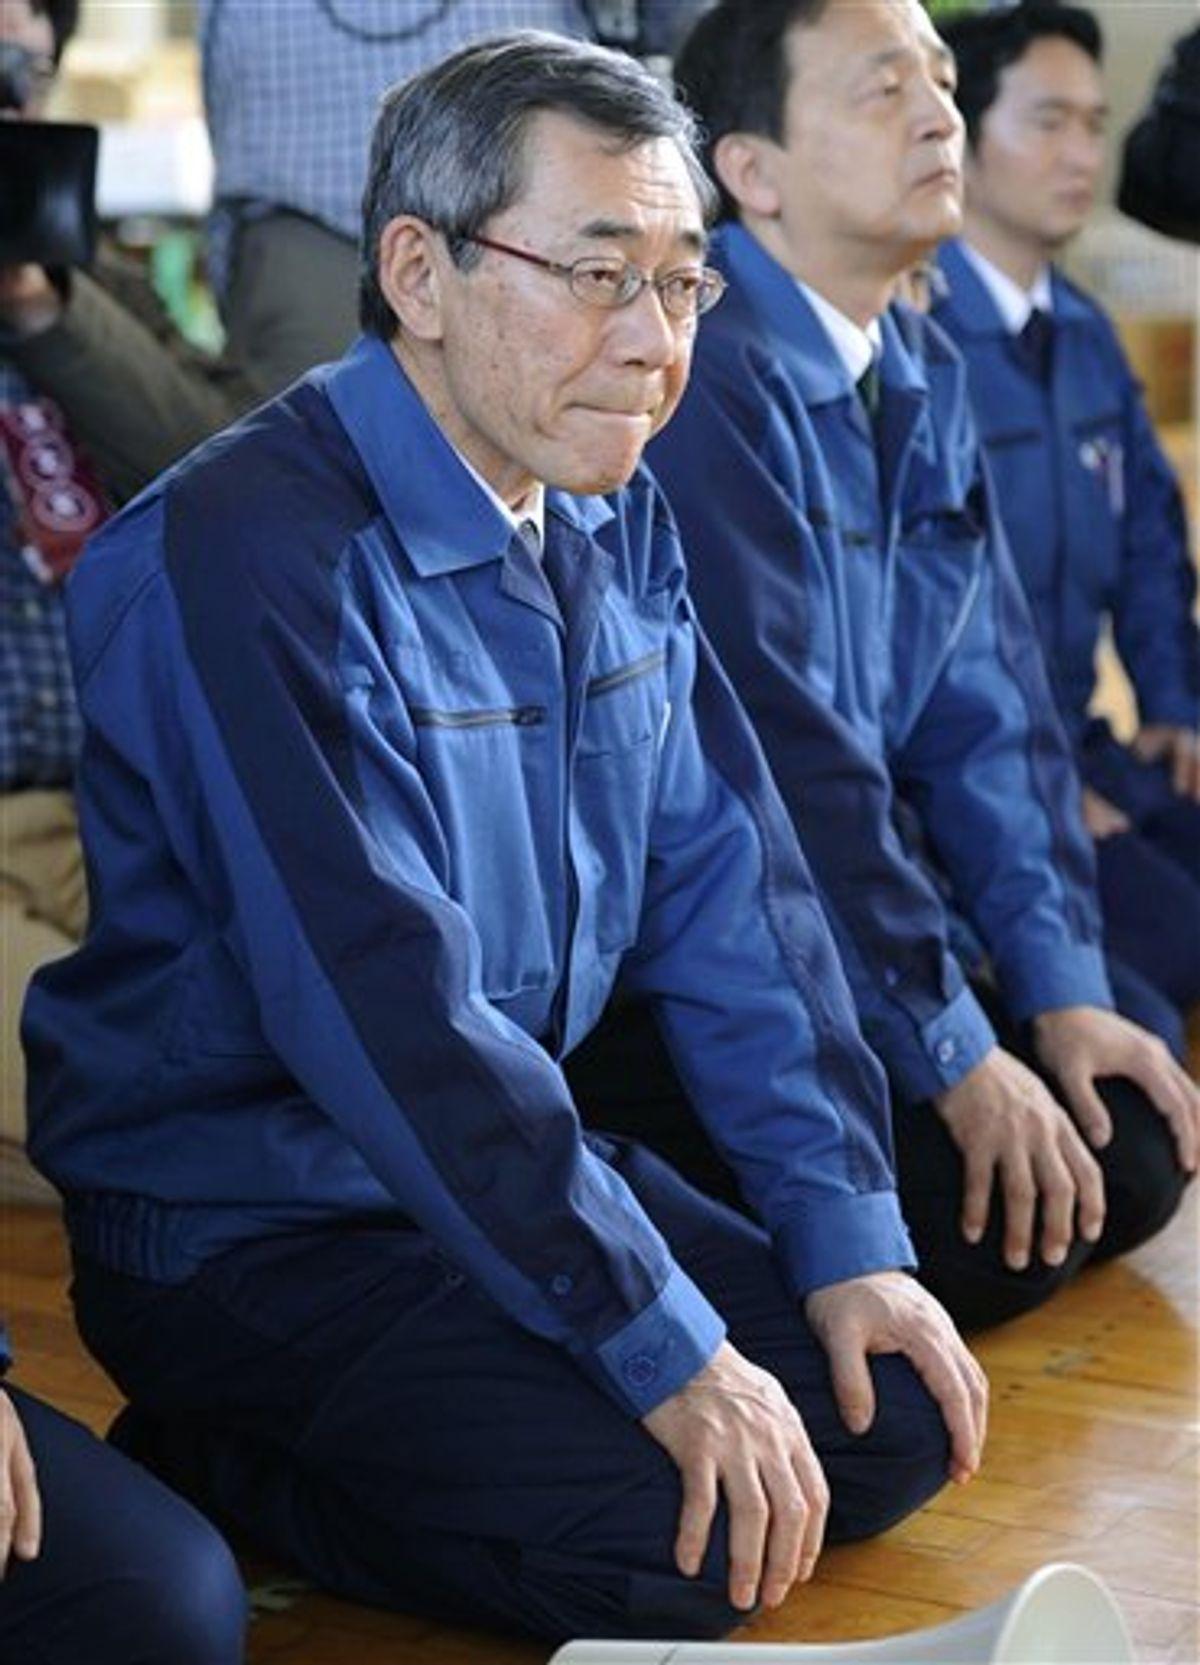 FILE - In this May 4, 2011 file photo, Tokyo Electric Power Co. President Masataka Shimizu, front, listens to Namie villagers at an evacuation center at Nihonmatsu in Fukushima prefecture.    Japanese media reports Friday, May 20, 2011, said Tokyo Electric Power Co. President Shimizu will resign to take responsibility for the nuclear crisis at the Fukushima Dai-ichi power complex in northeastern Japan.  (AP Photo/Kyodo News, File) JAPAN OUT, MANDATORY CREDIT, NO LICENSING IN CHINA, HONG KONG, JAPAN, SOUTH KOREA AND FRANCE (AP)